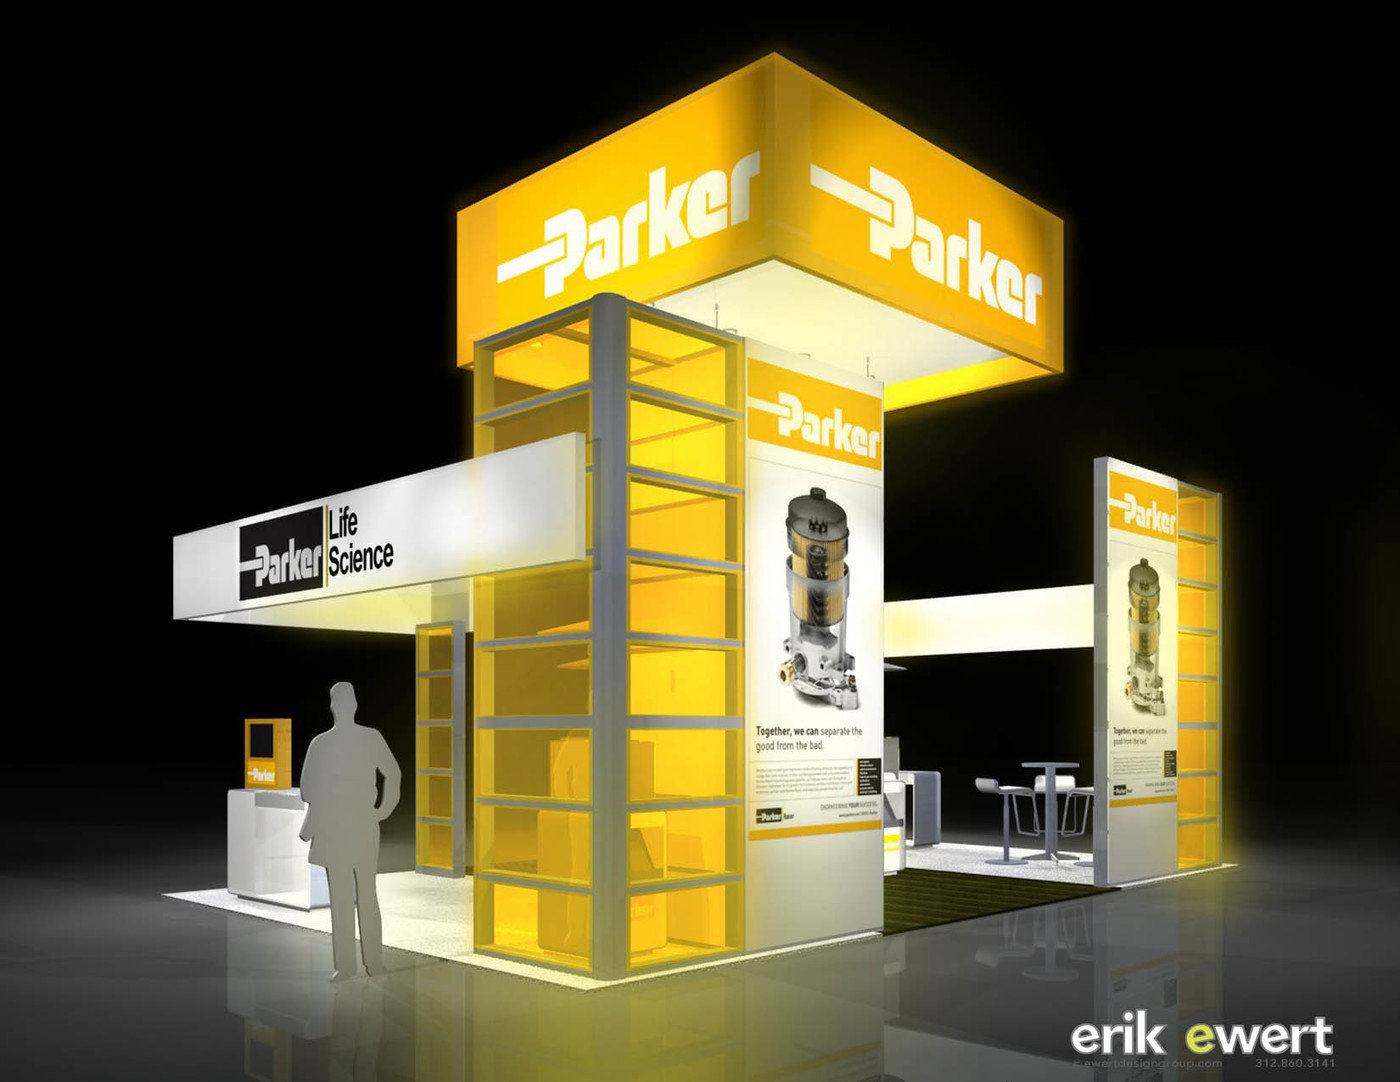 Collection Brand Architecture 01 By Erik Ewert At